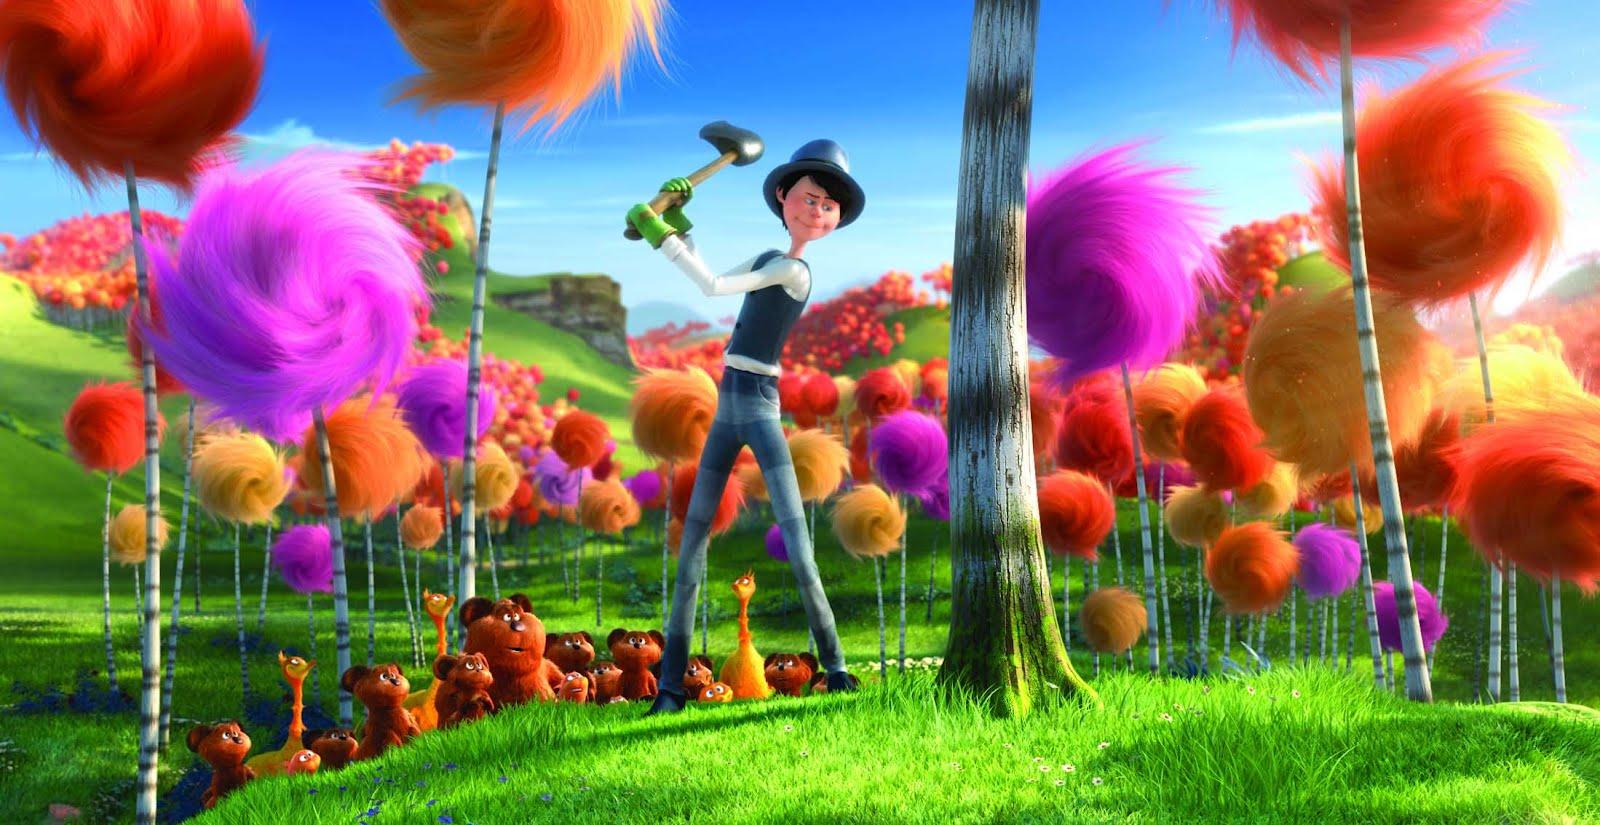 zakka life: Get Creative with The Lorax: Truffula Tree Pencils